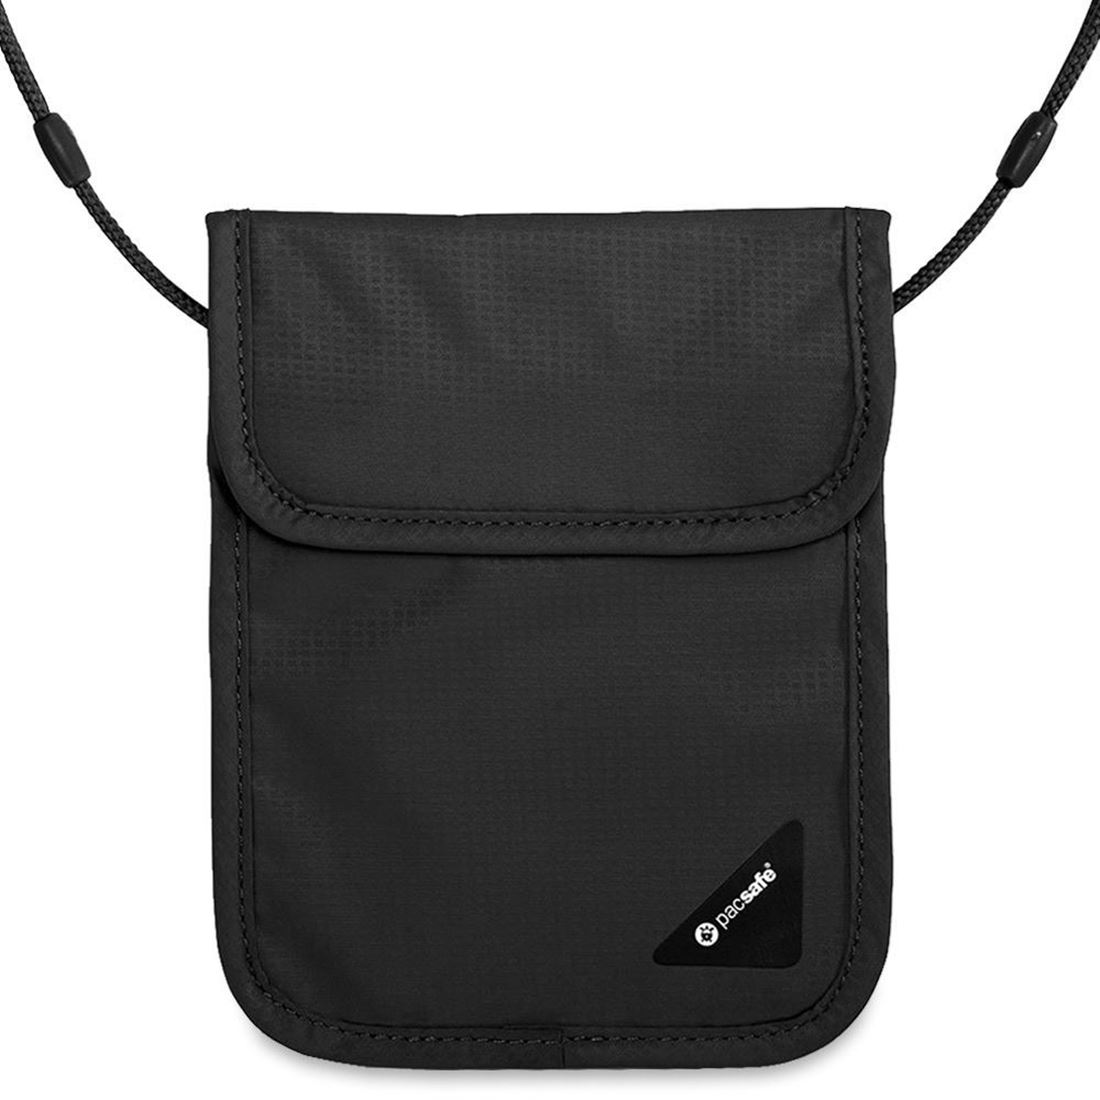 Pacsafe Coversafe X75 RFID Blocking Neck Pouch - Black